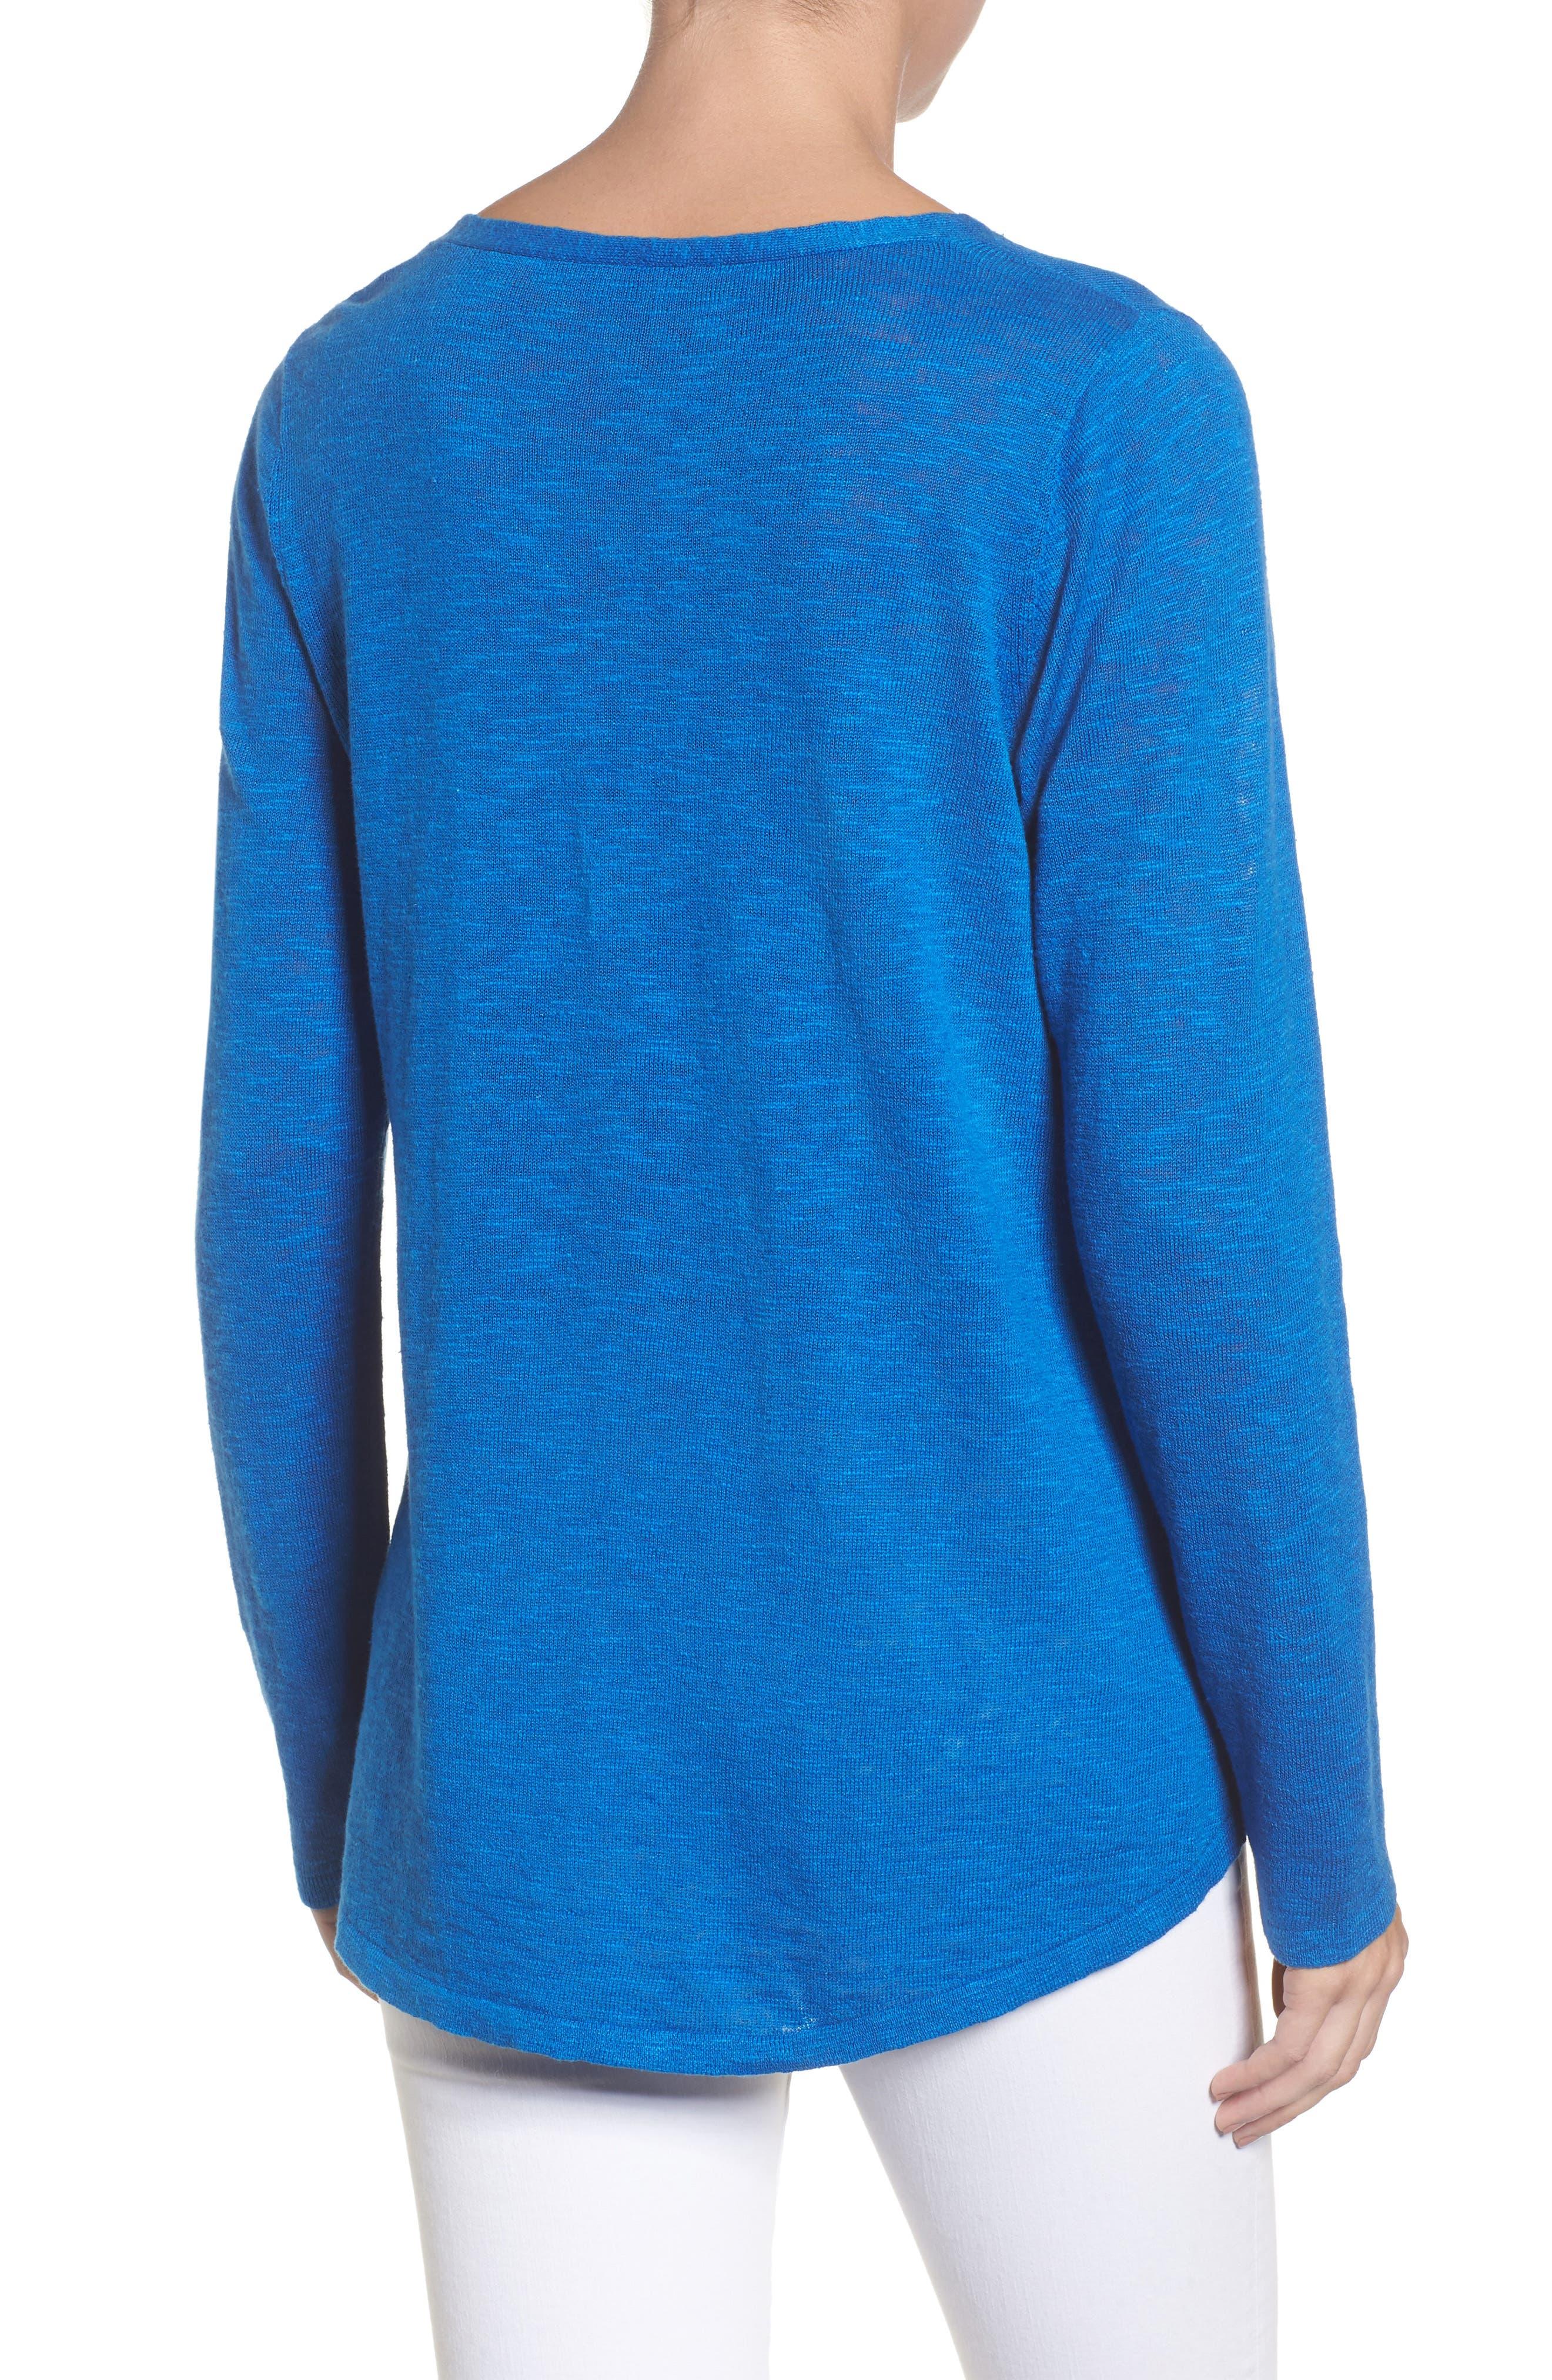 Organic Linen & Cotton V-Neck Sweater,                             Alternate thumbnail 2, color,                             Catalina